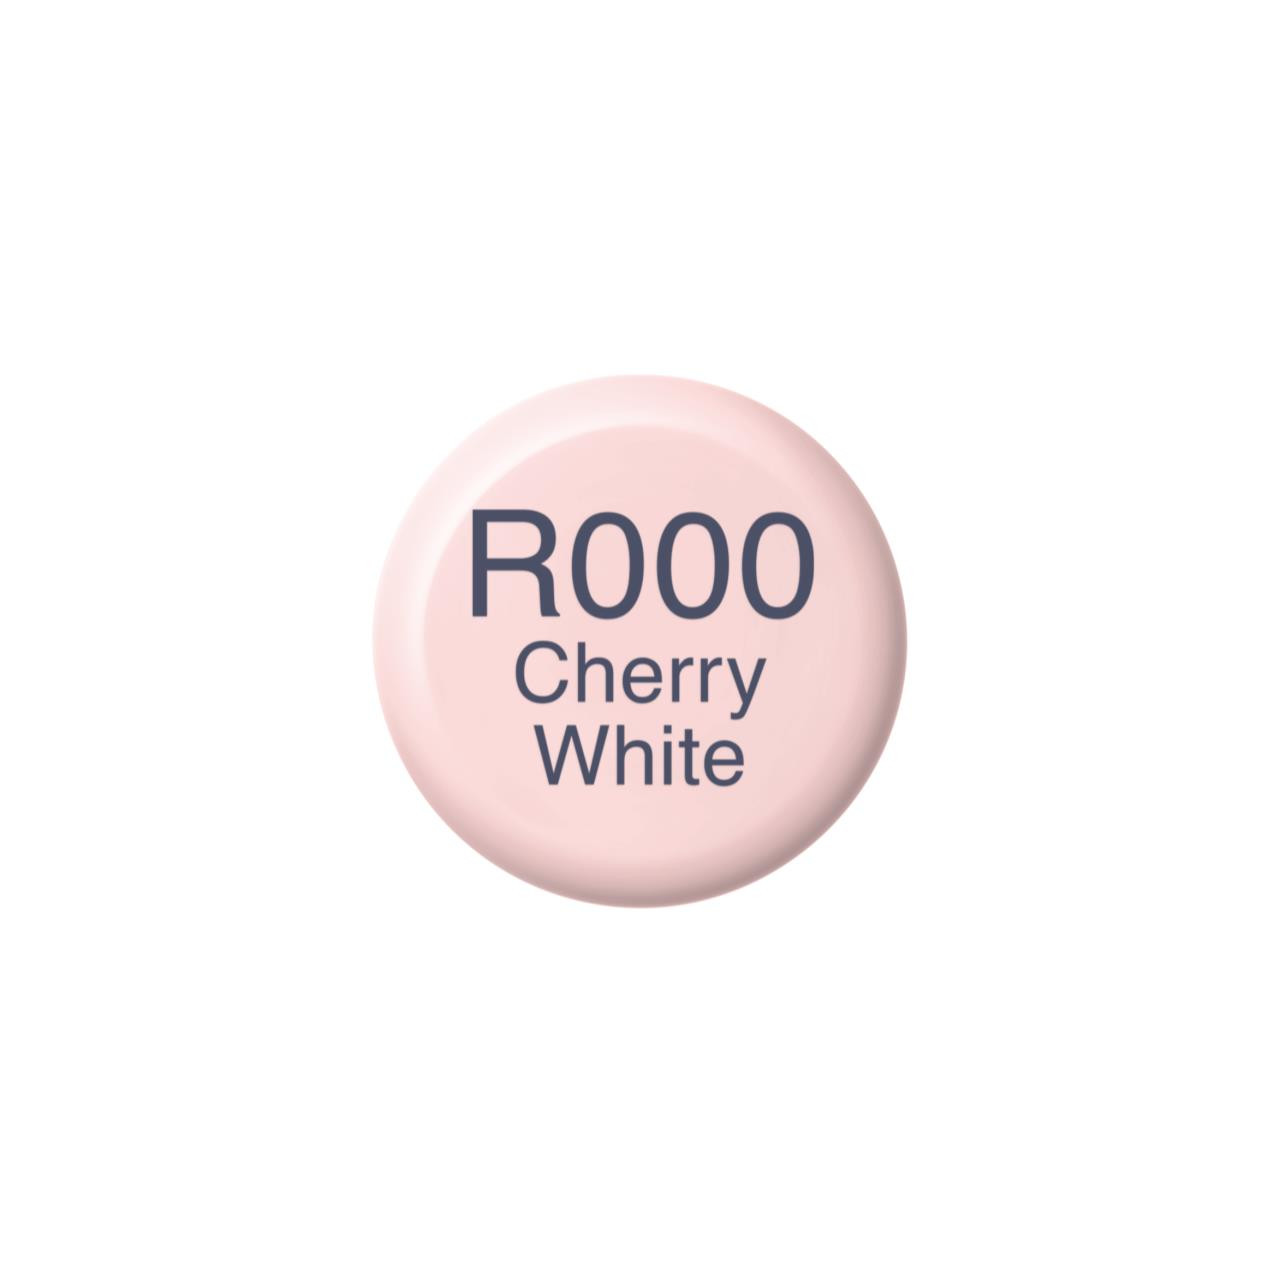 R000 Cherry White, Copic Ink - 4511338057377